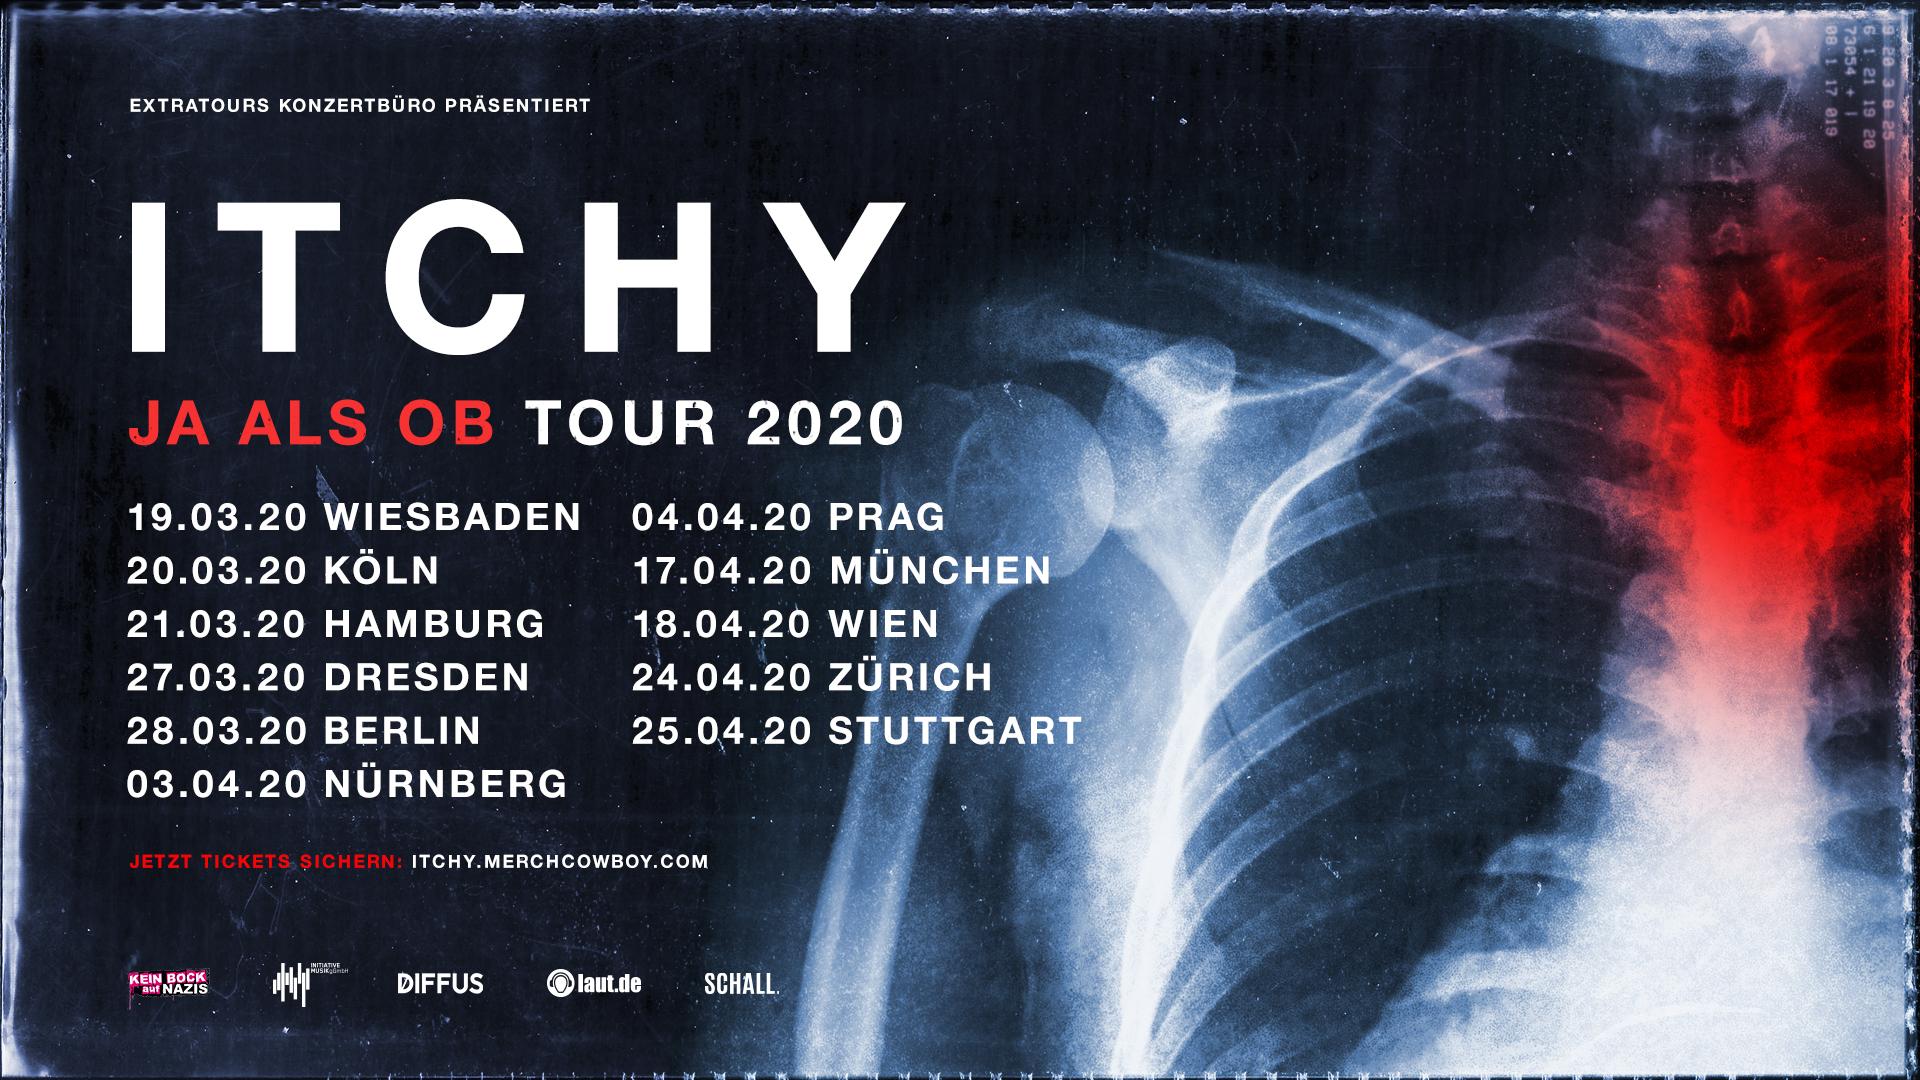 itchy_tour2020_FB_PROFIL_HEAD